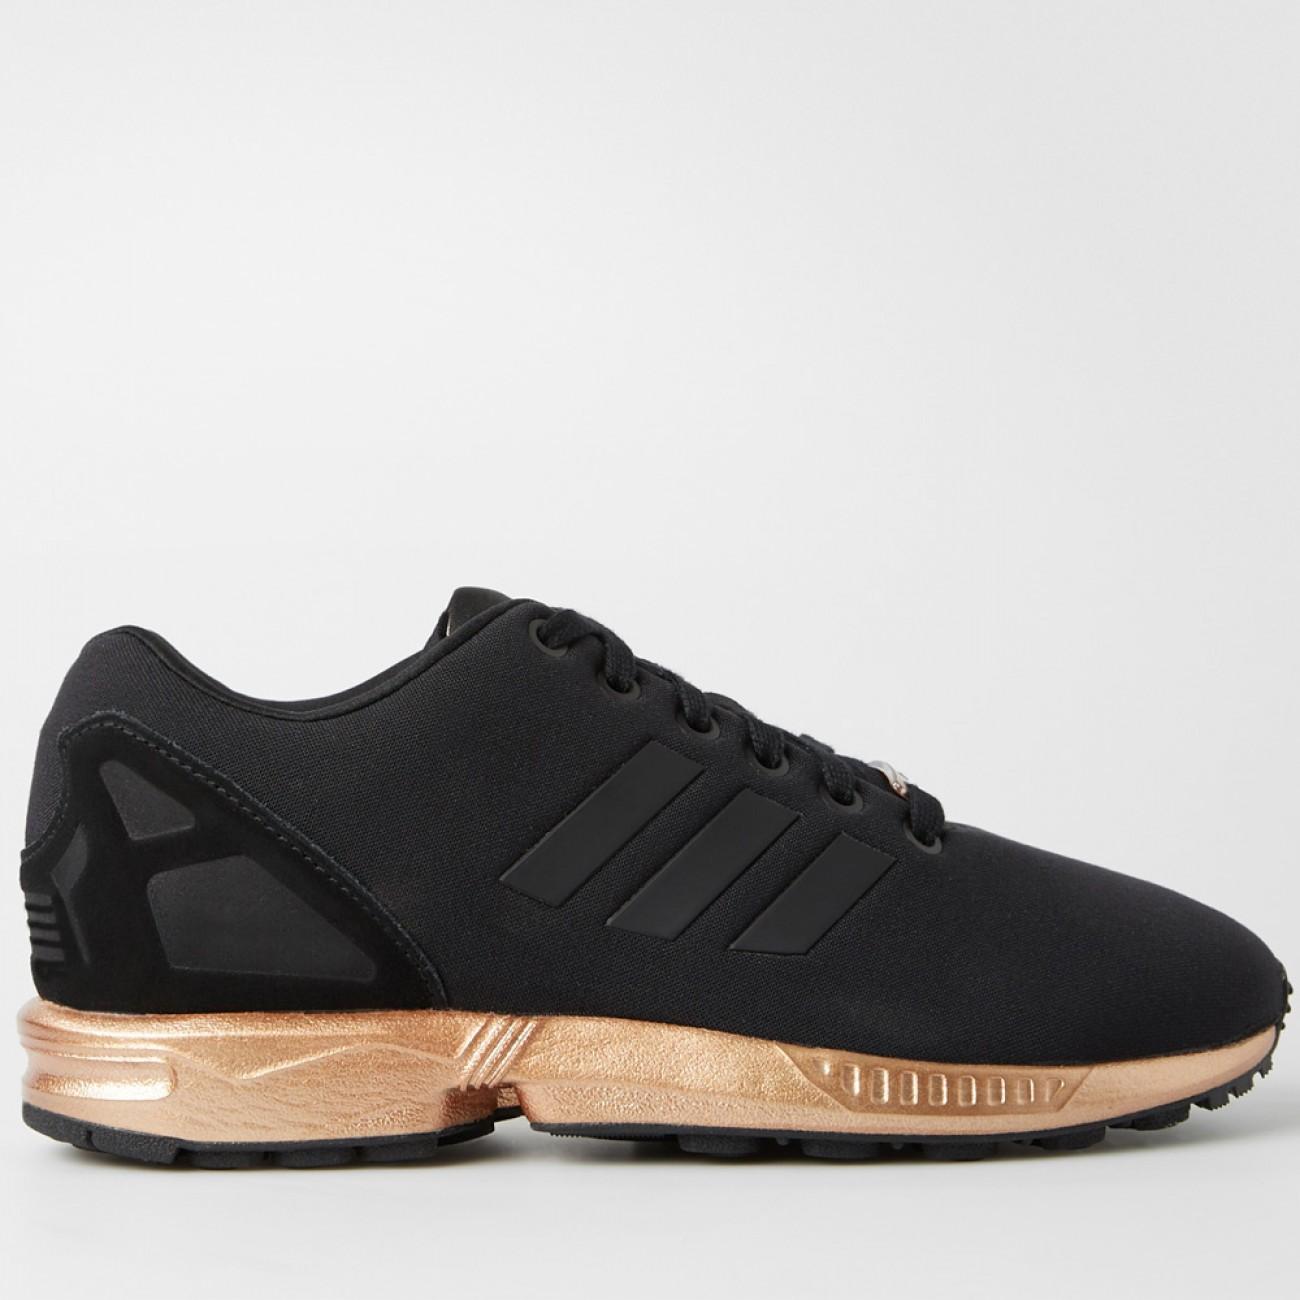 Adidas Zx Flux Black Gold